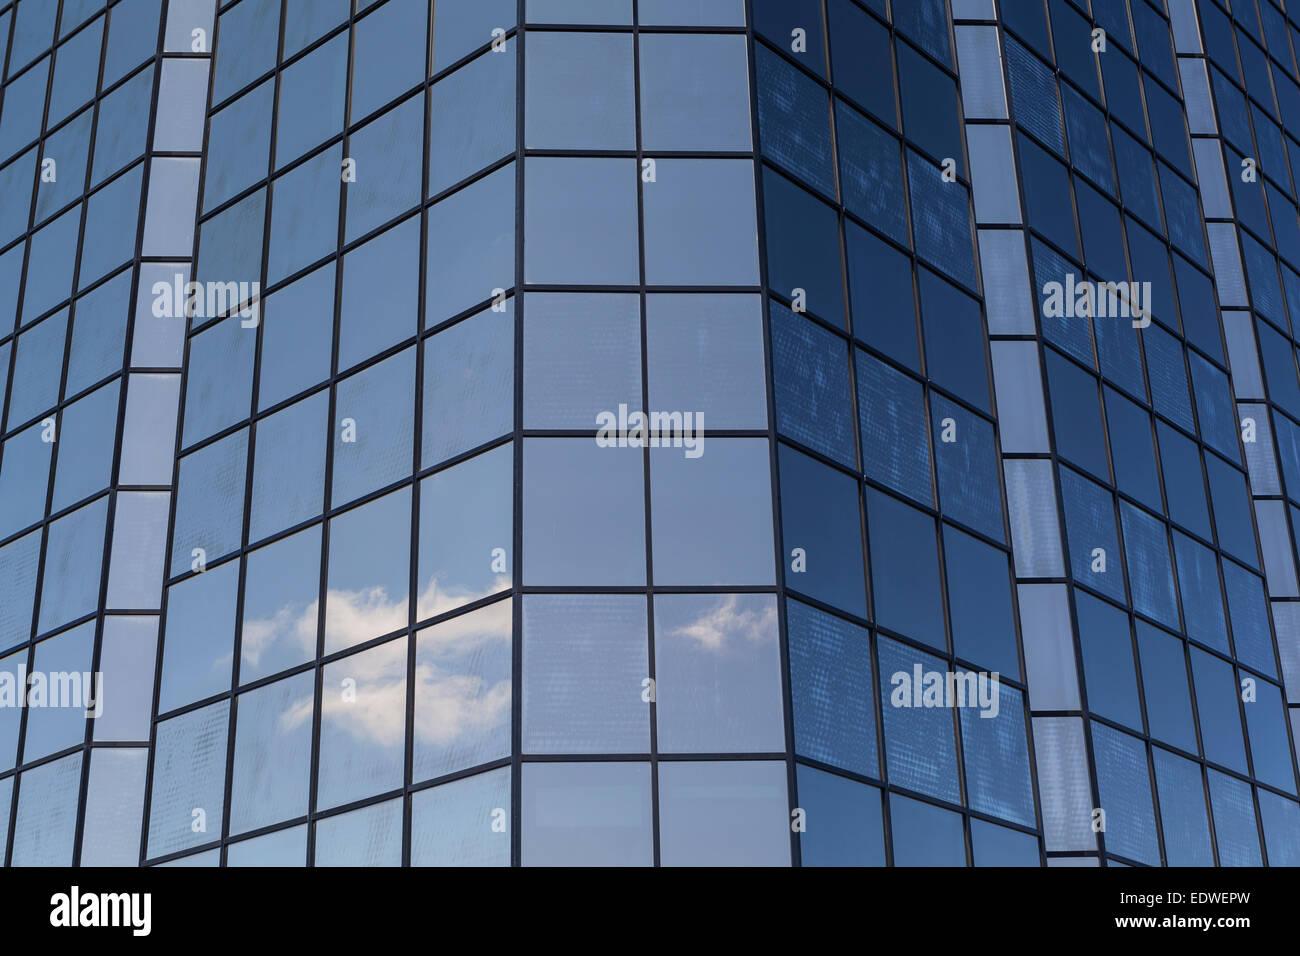 Sky-scraper windows,office building - Stock Image